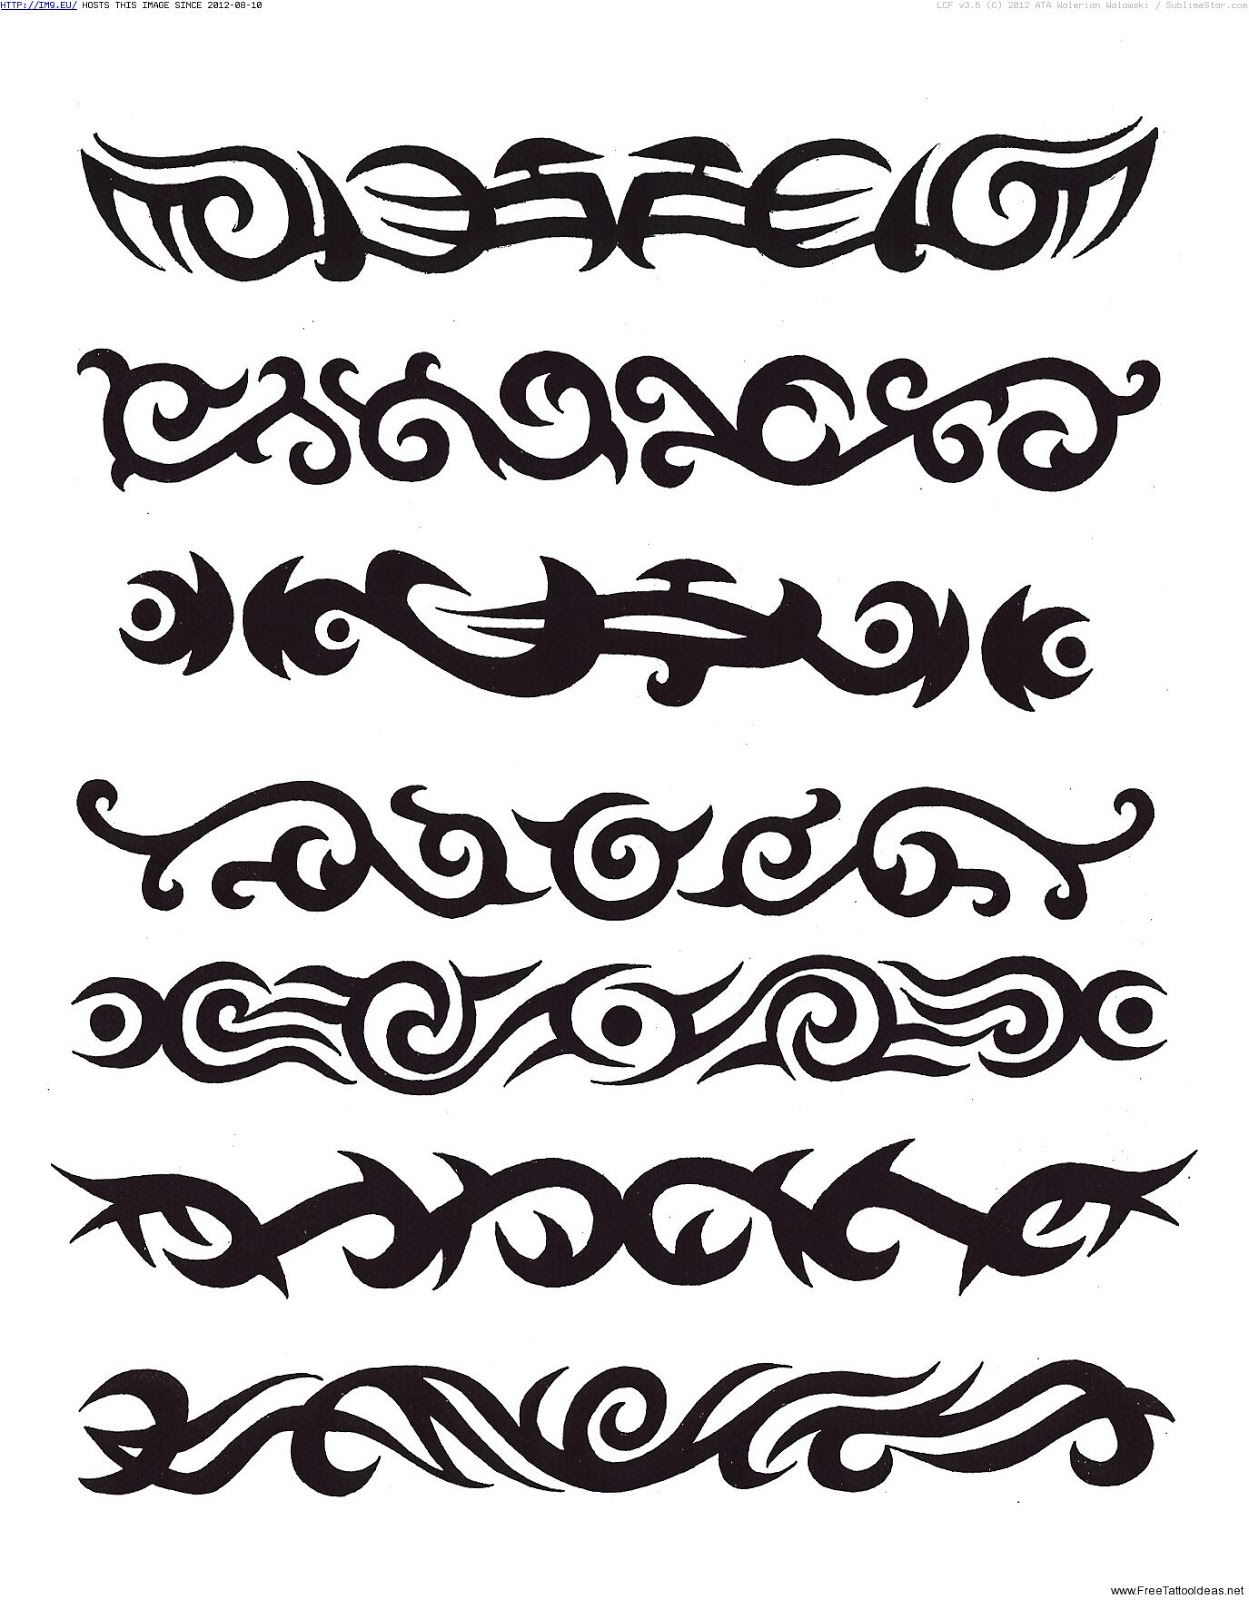 495859b9f Ideal Tattoo Ideas Most Effective Free Armband Tattoos. Armband Tattoos  Tribal Native American And Feminine Designs